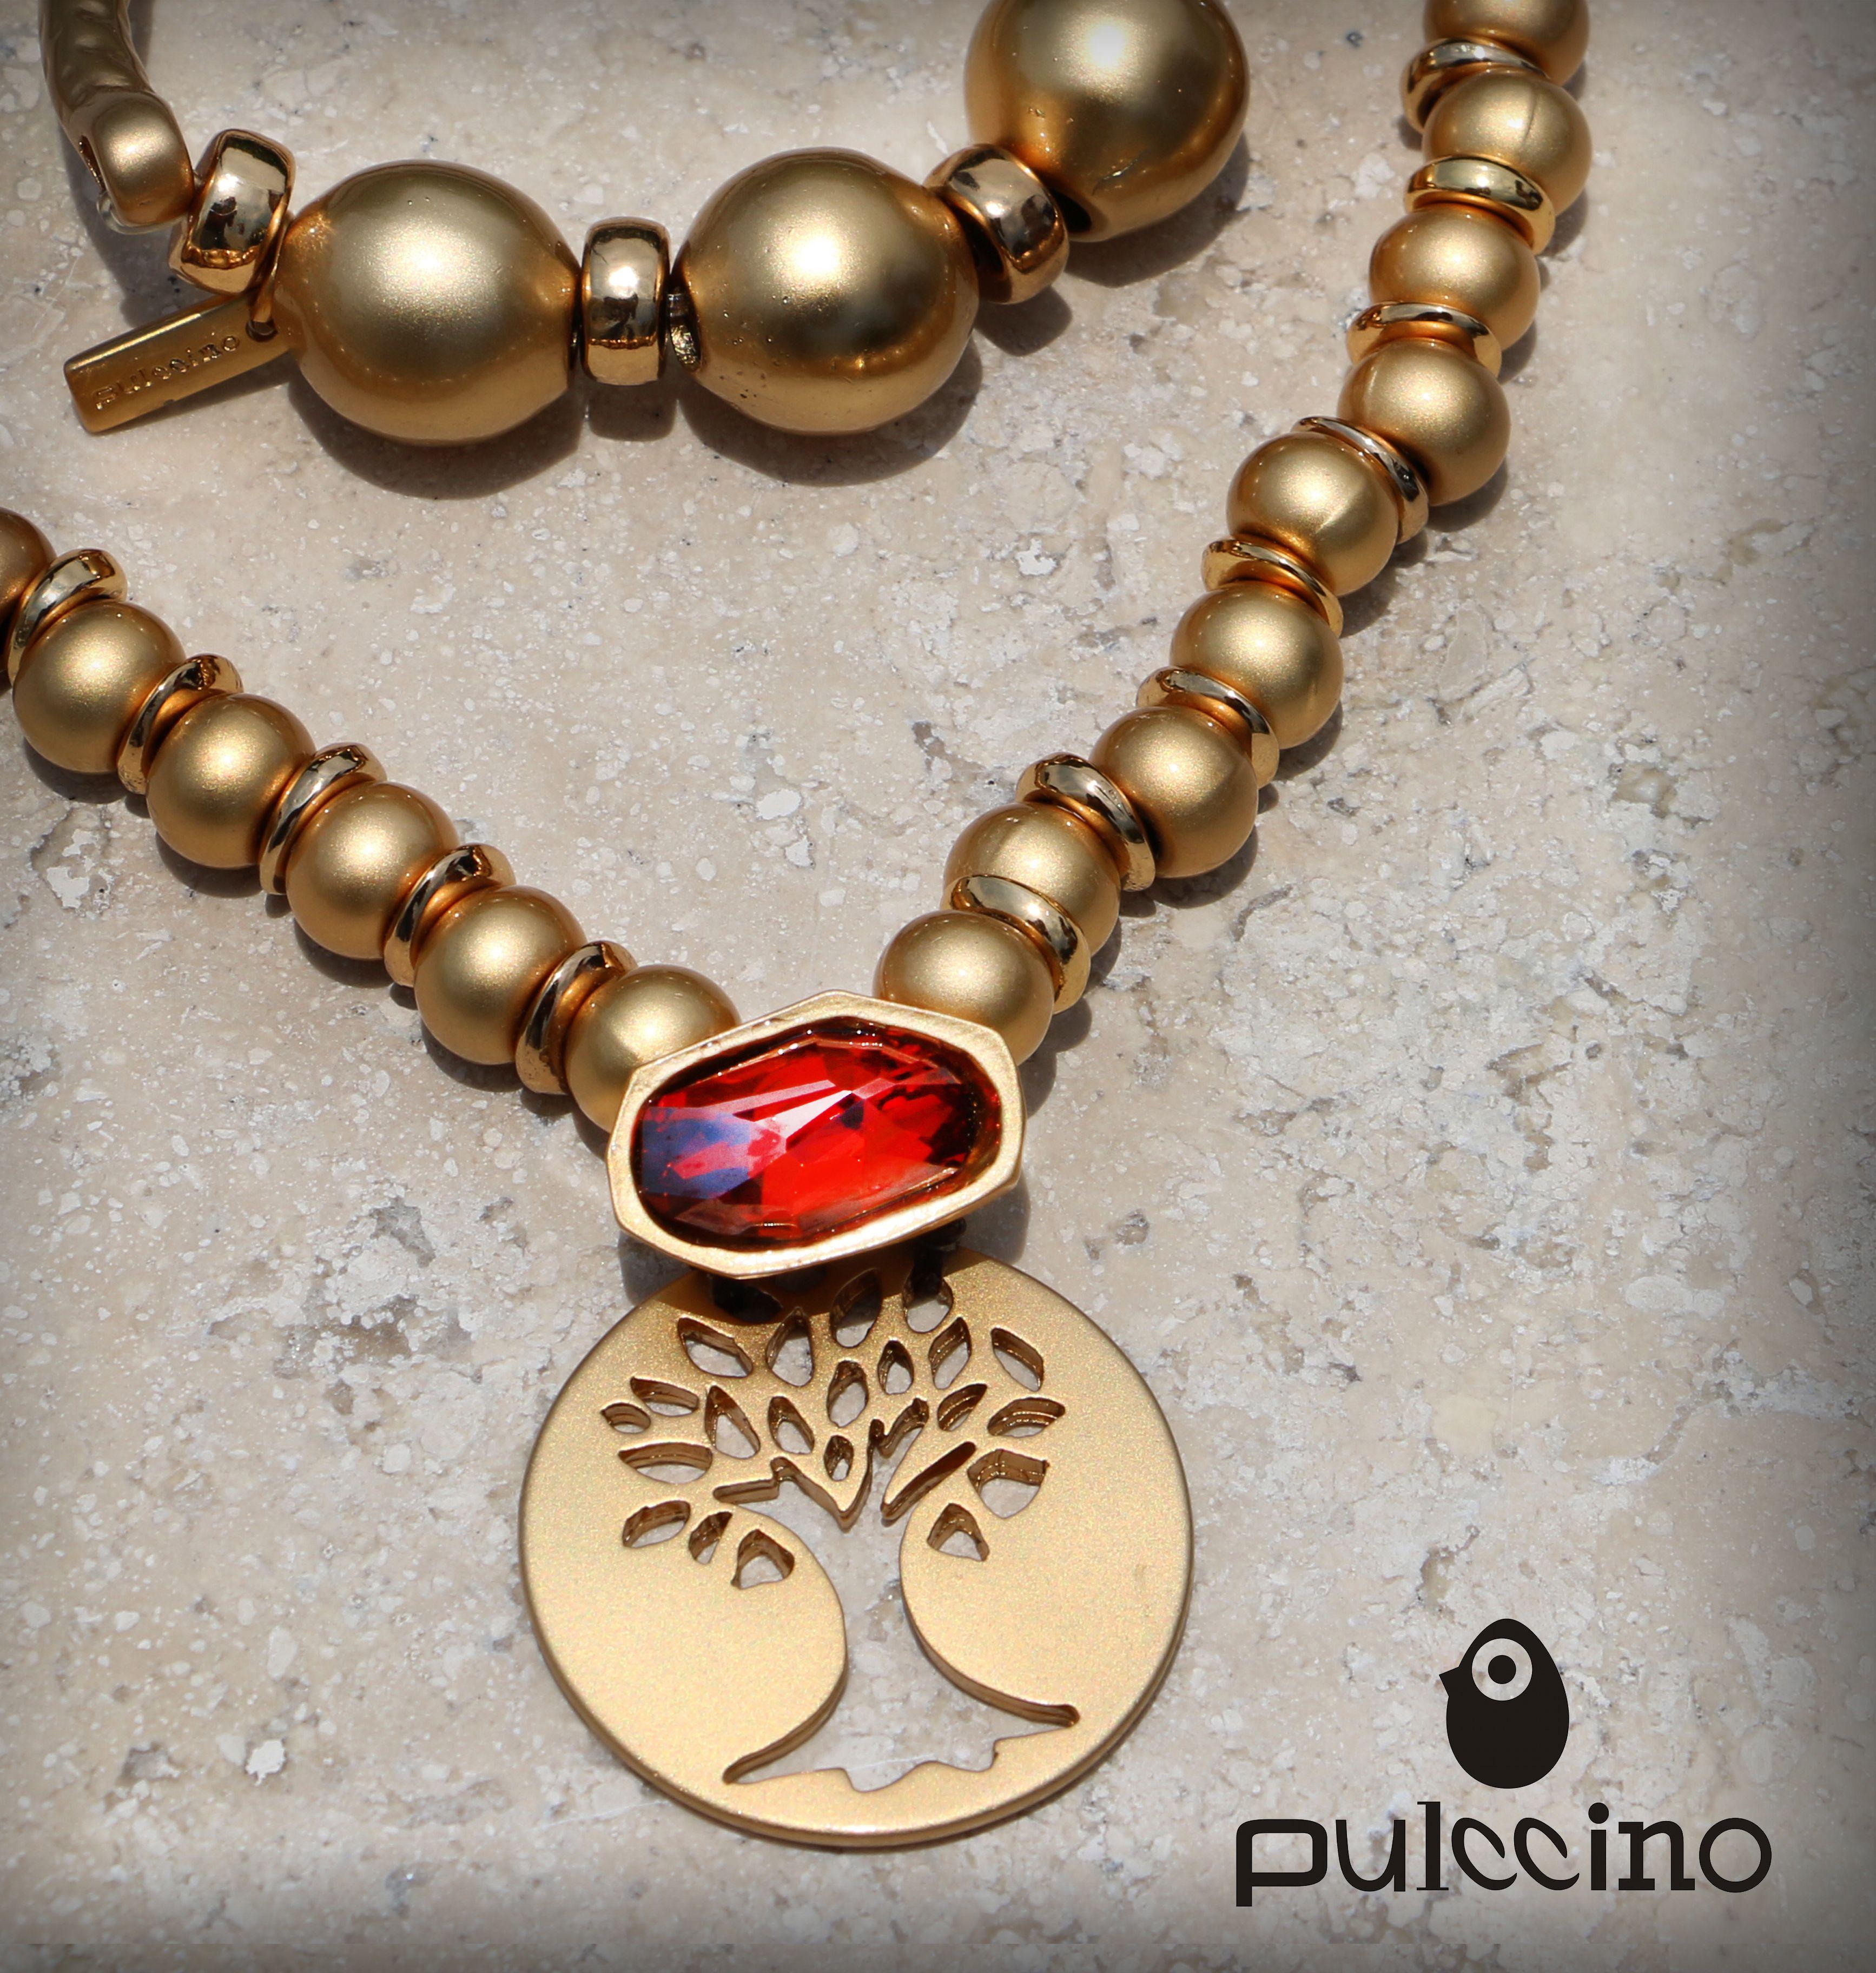 8c6d57a7d976  pulccino  joyeria  accesorios  jewelry Pulseras